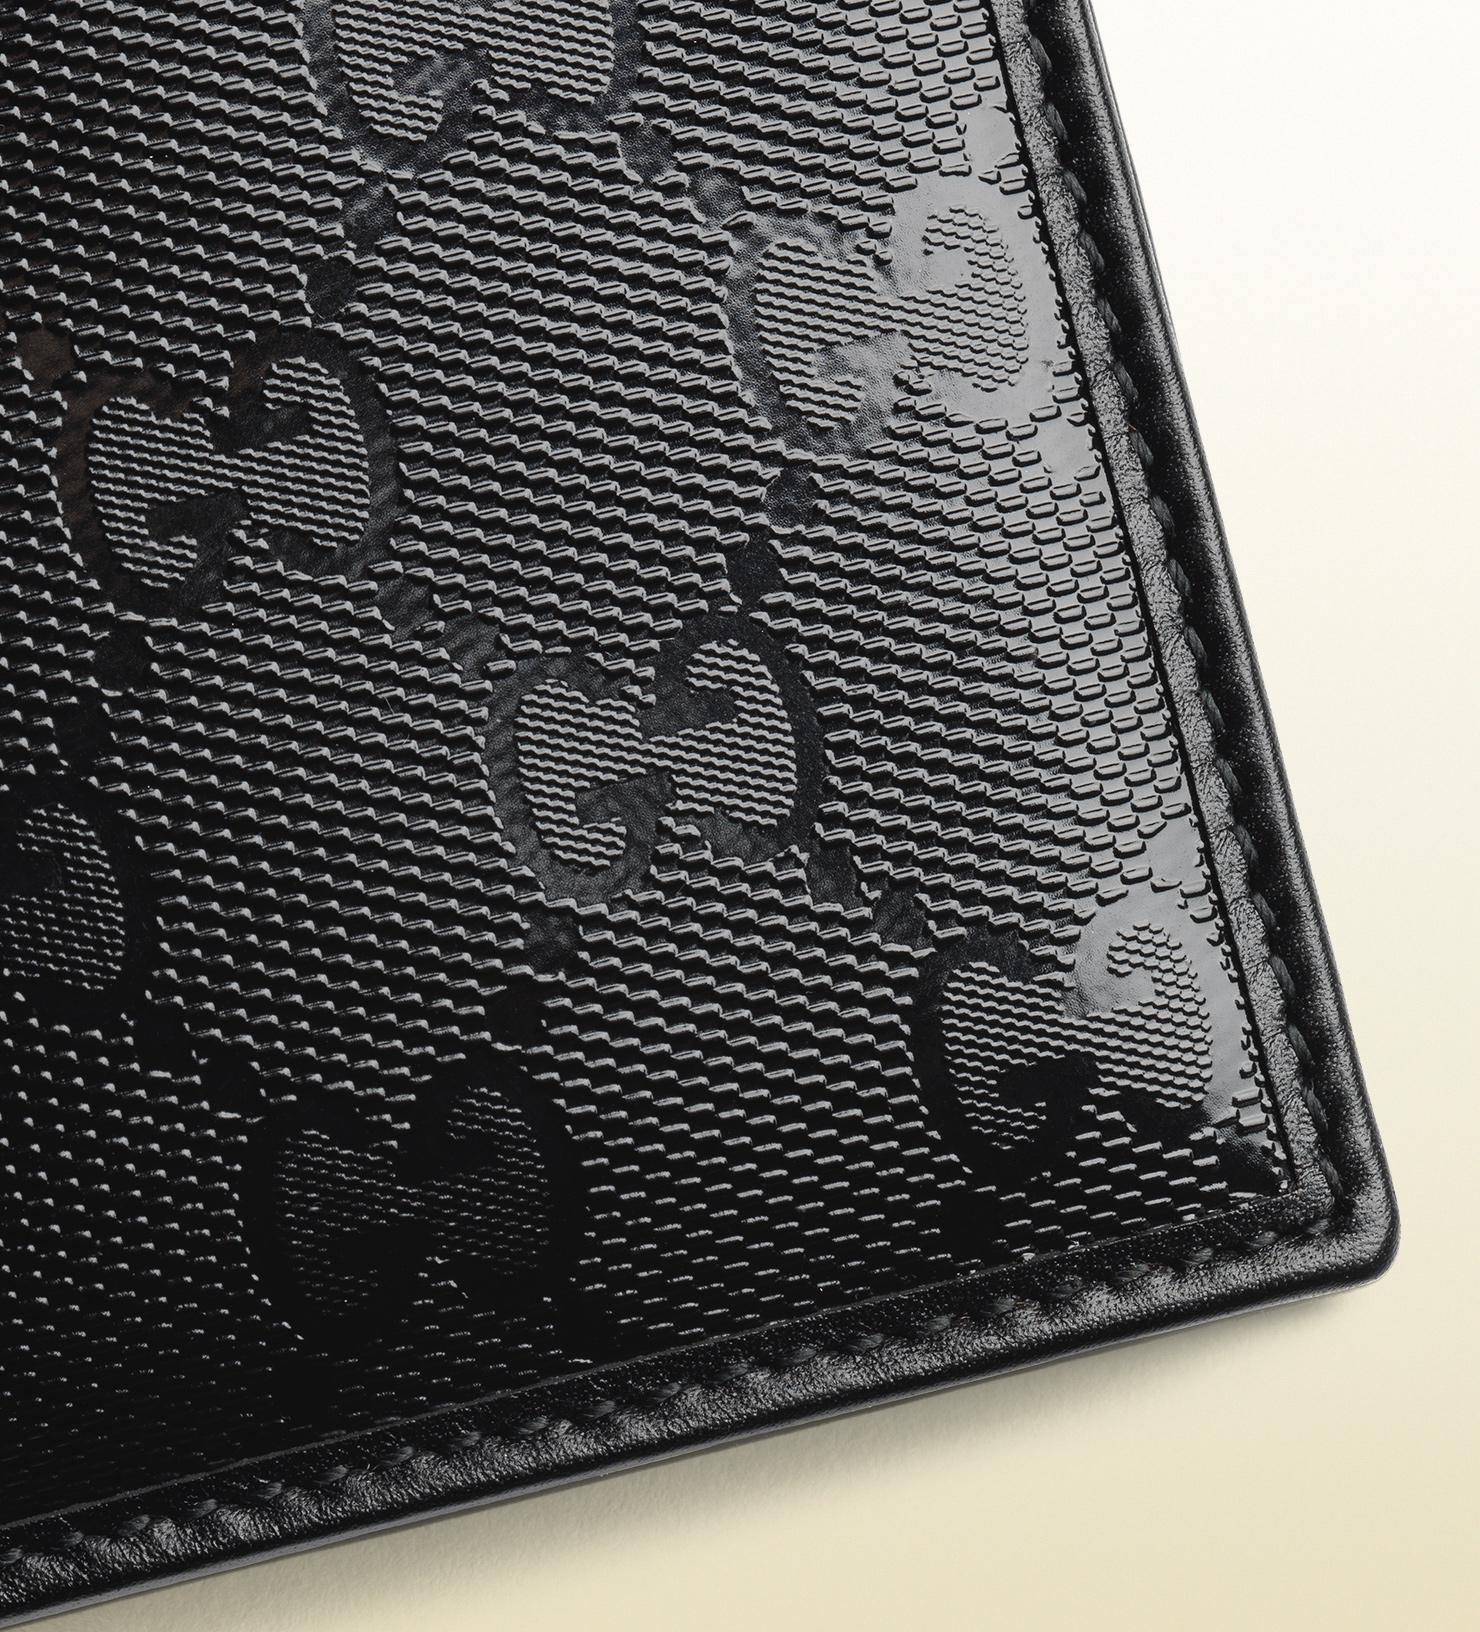 Gucci Gg Imprimé Leather Bi-fold Wallet in Black - Lyst